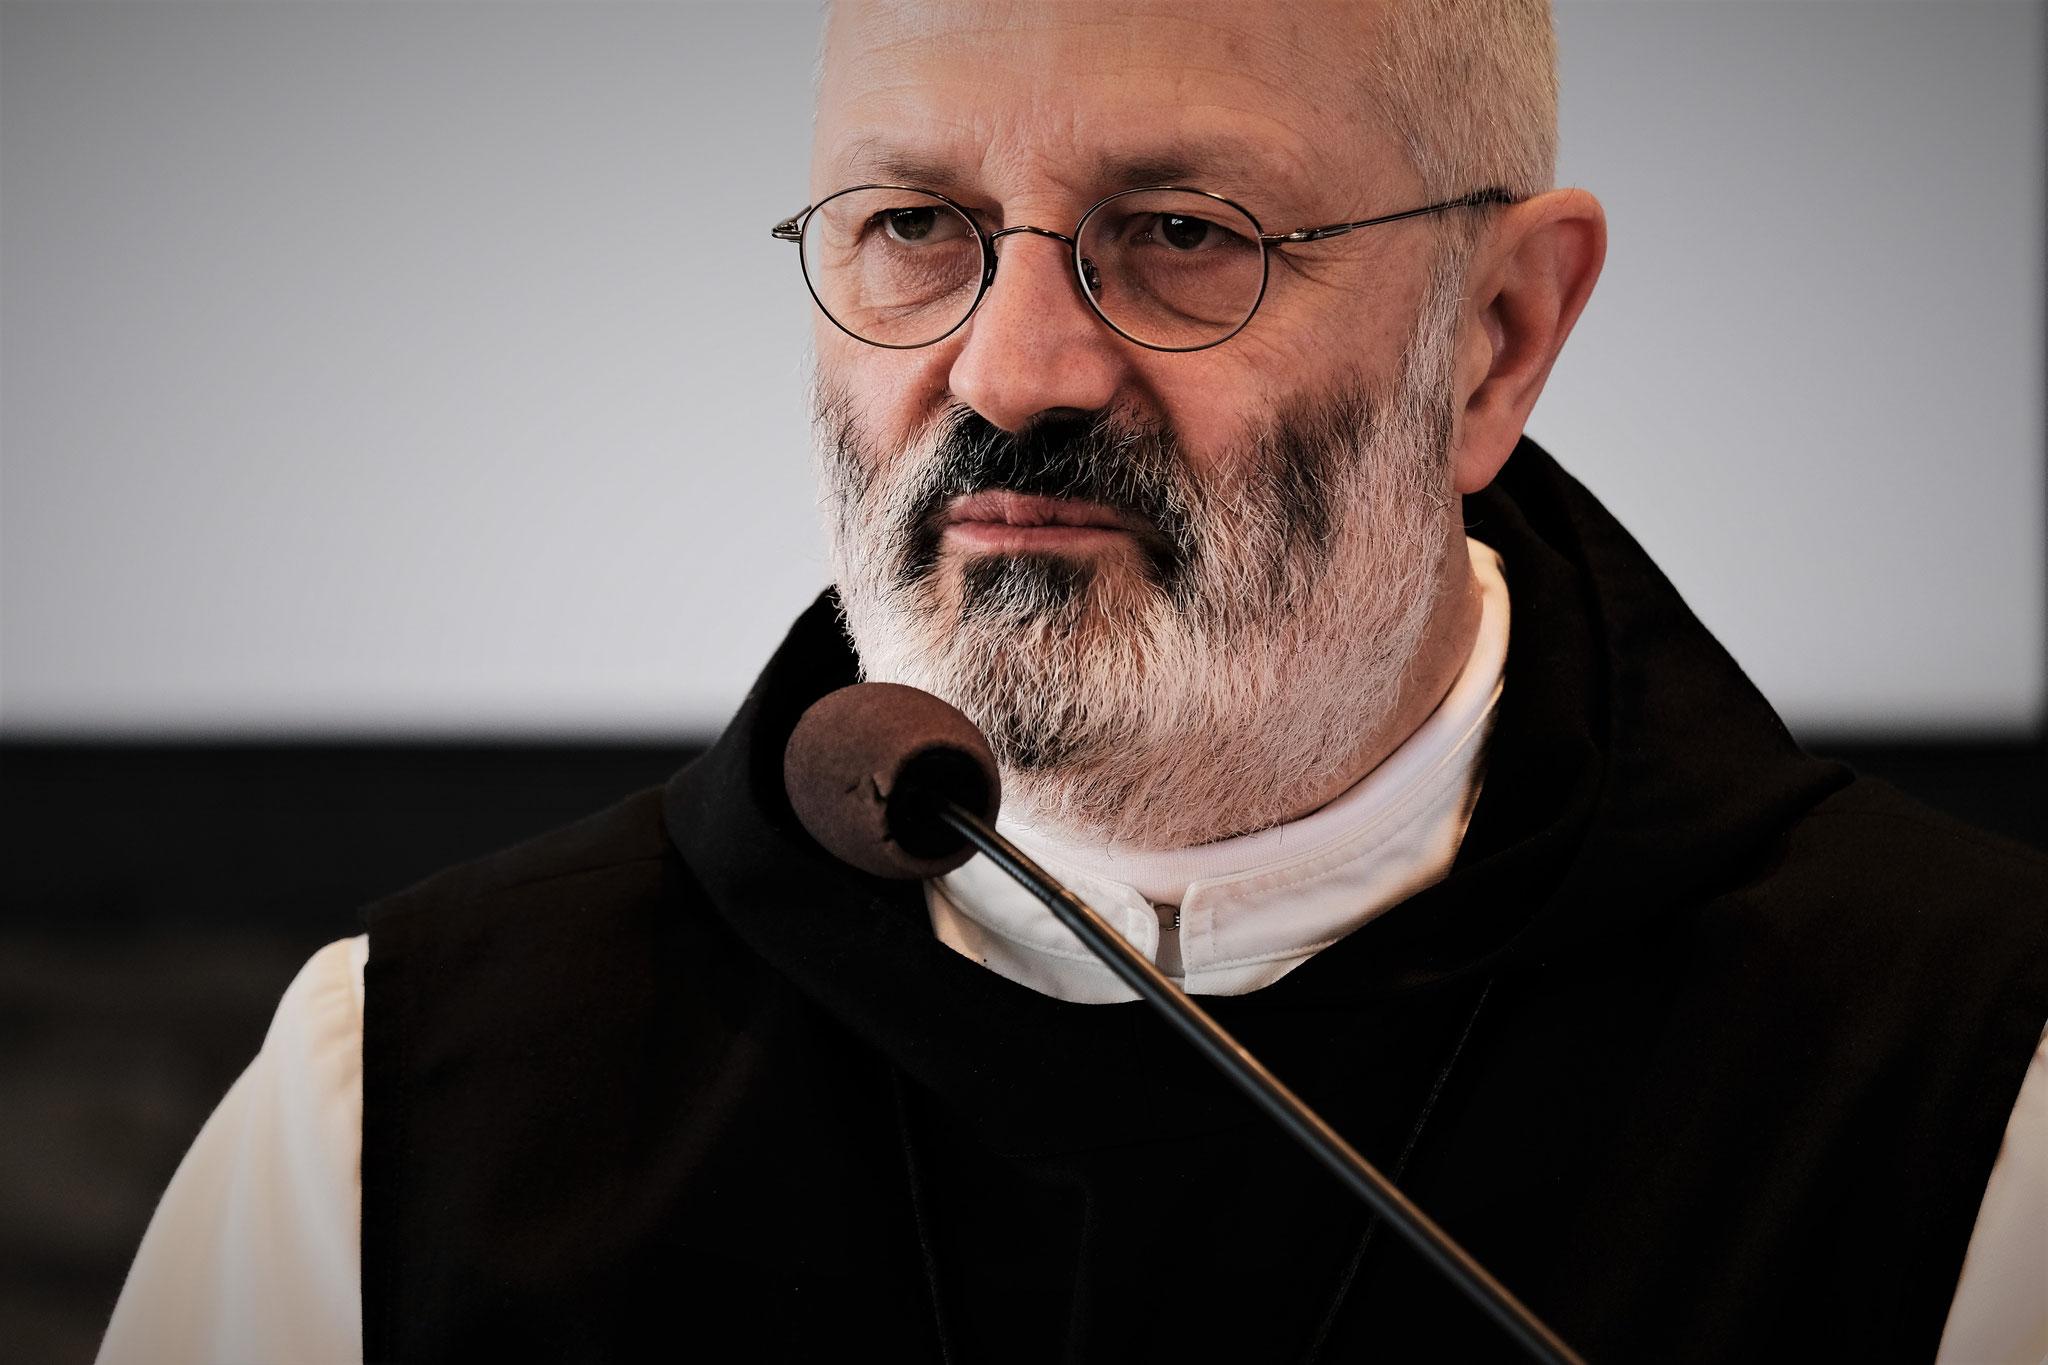 Mauro-Giuseppe Lepori OCist